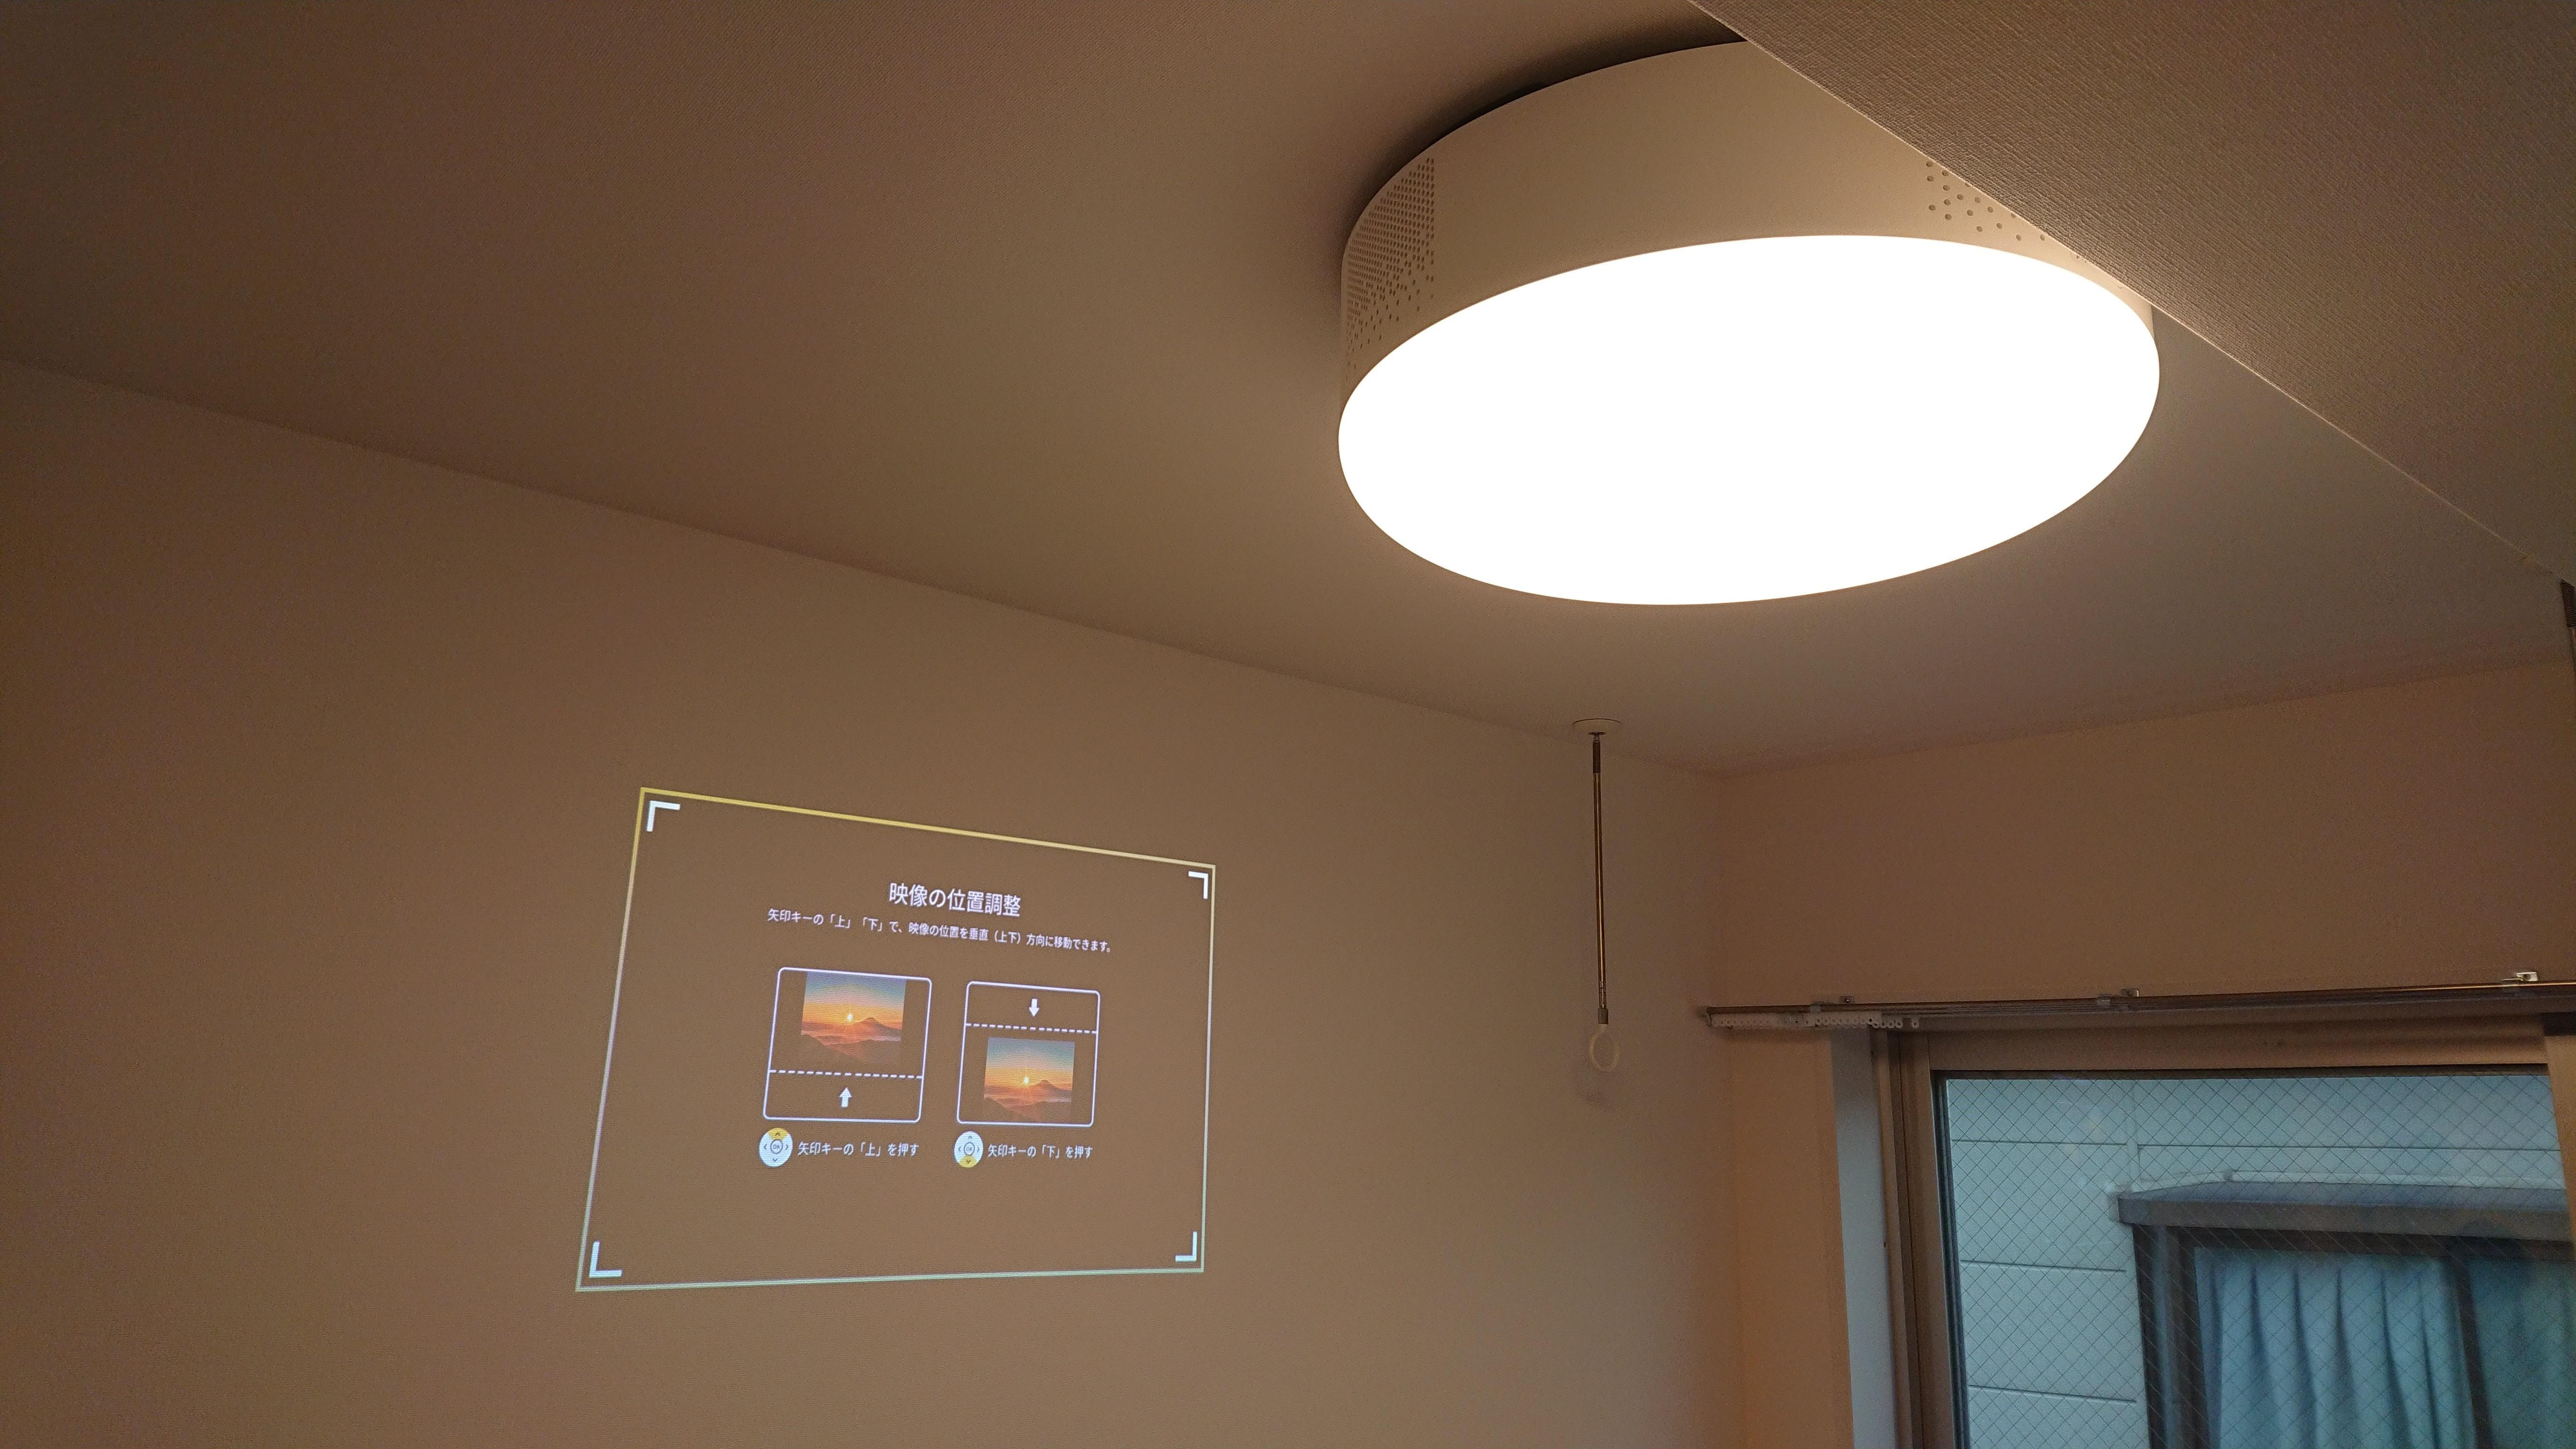 3in1シーリングライト大画面で視聴可能1